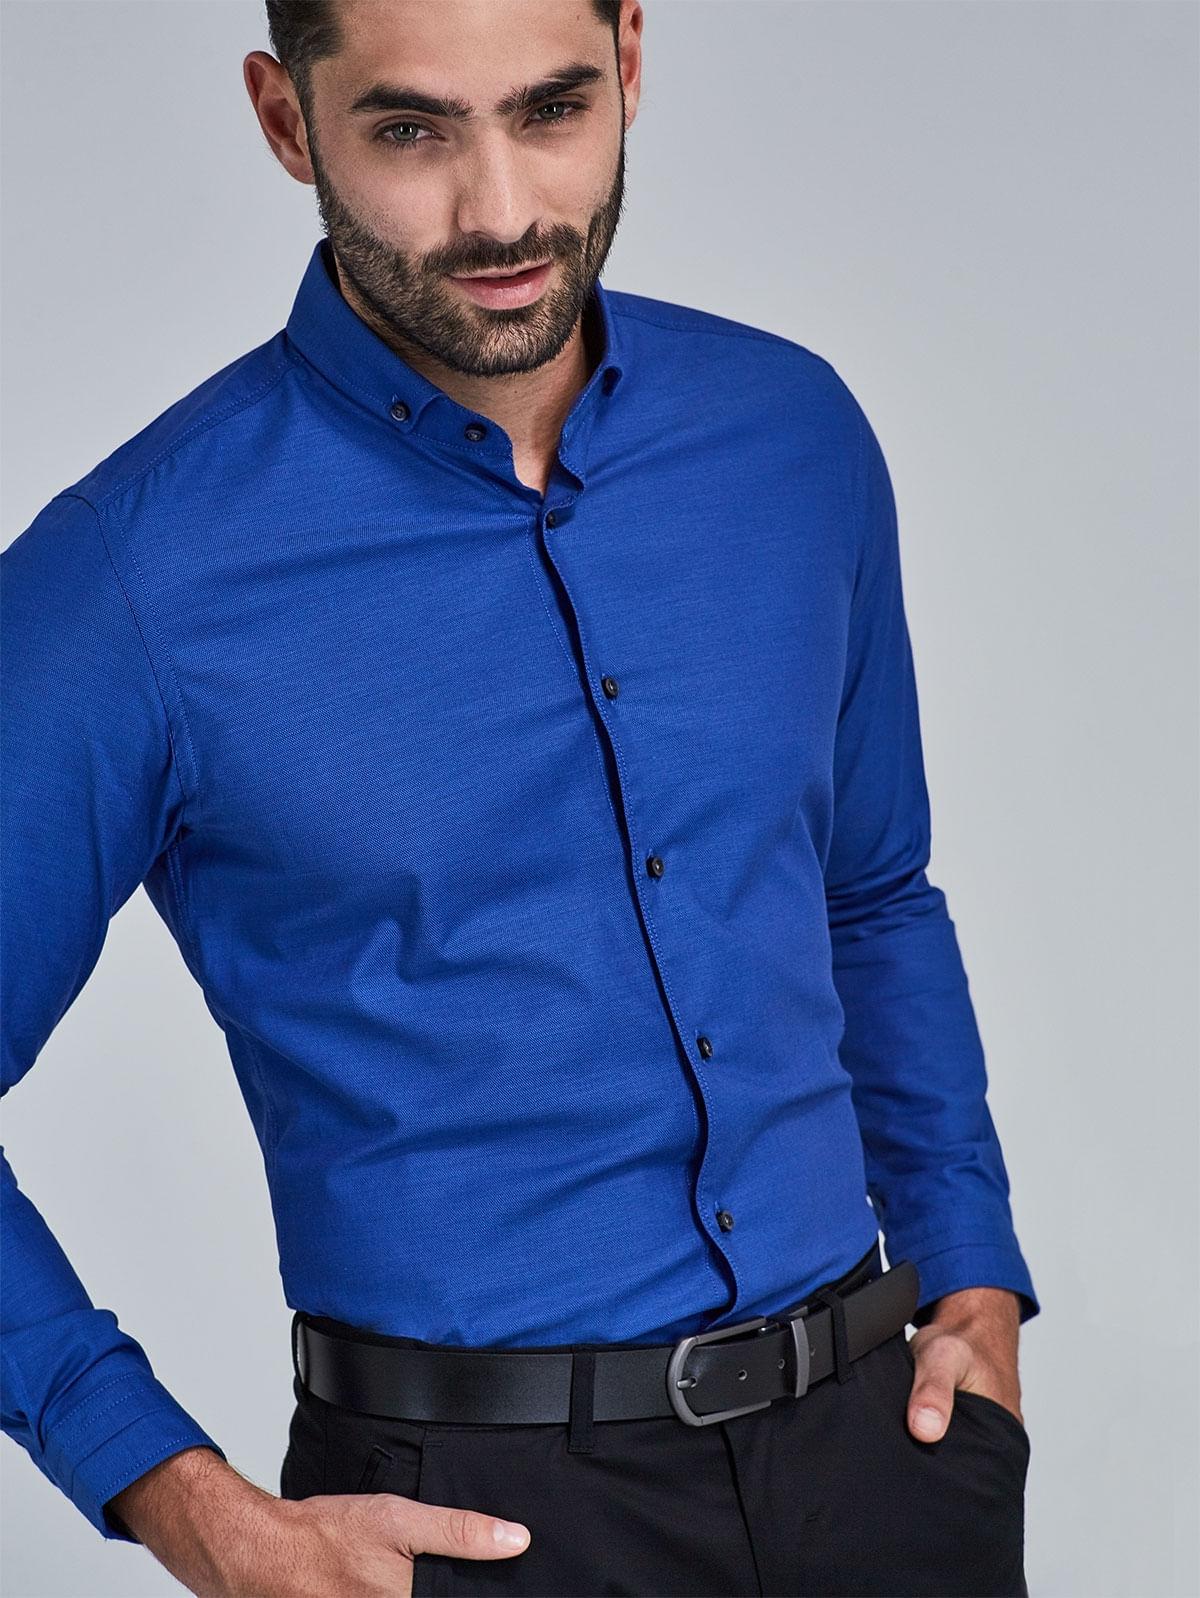 275f341161 Camisa Slim Fit Unicolor con Textura 78162 - Arturo Calle